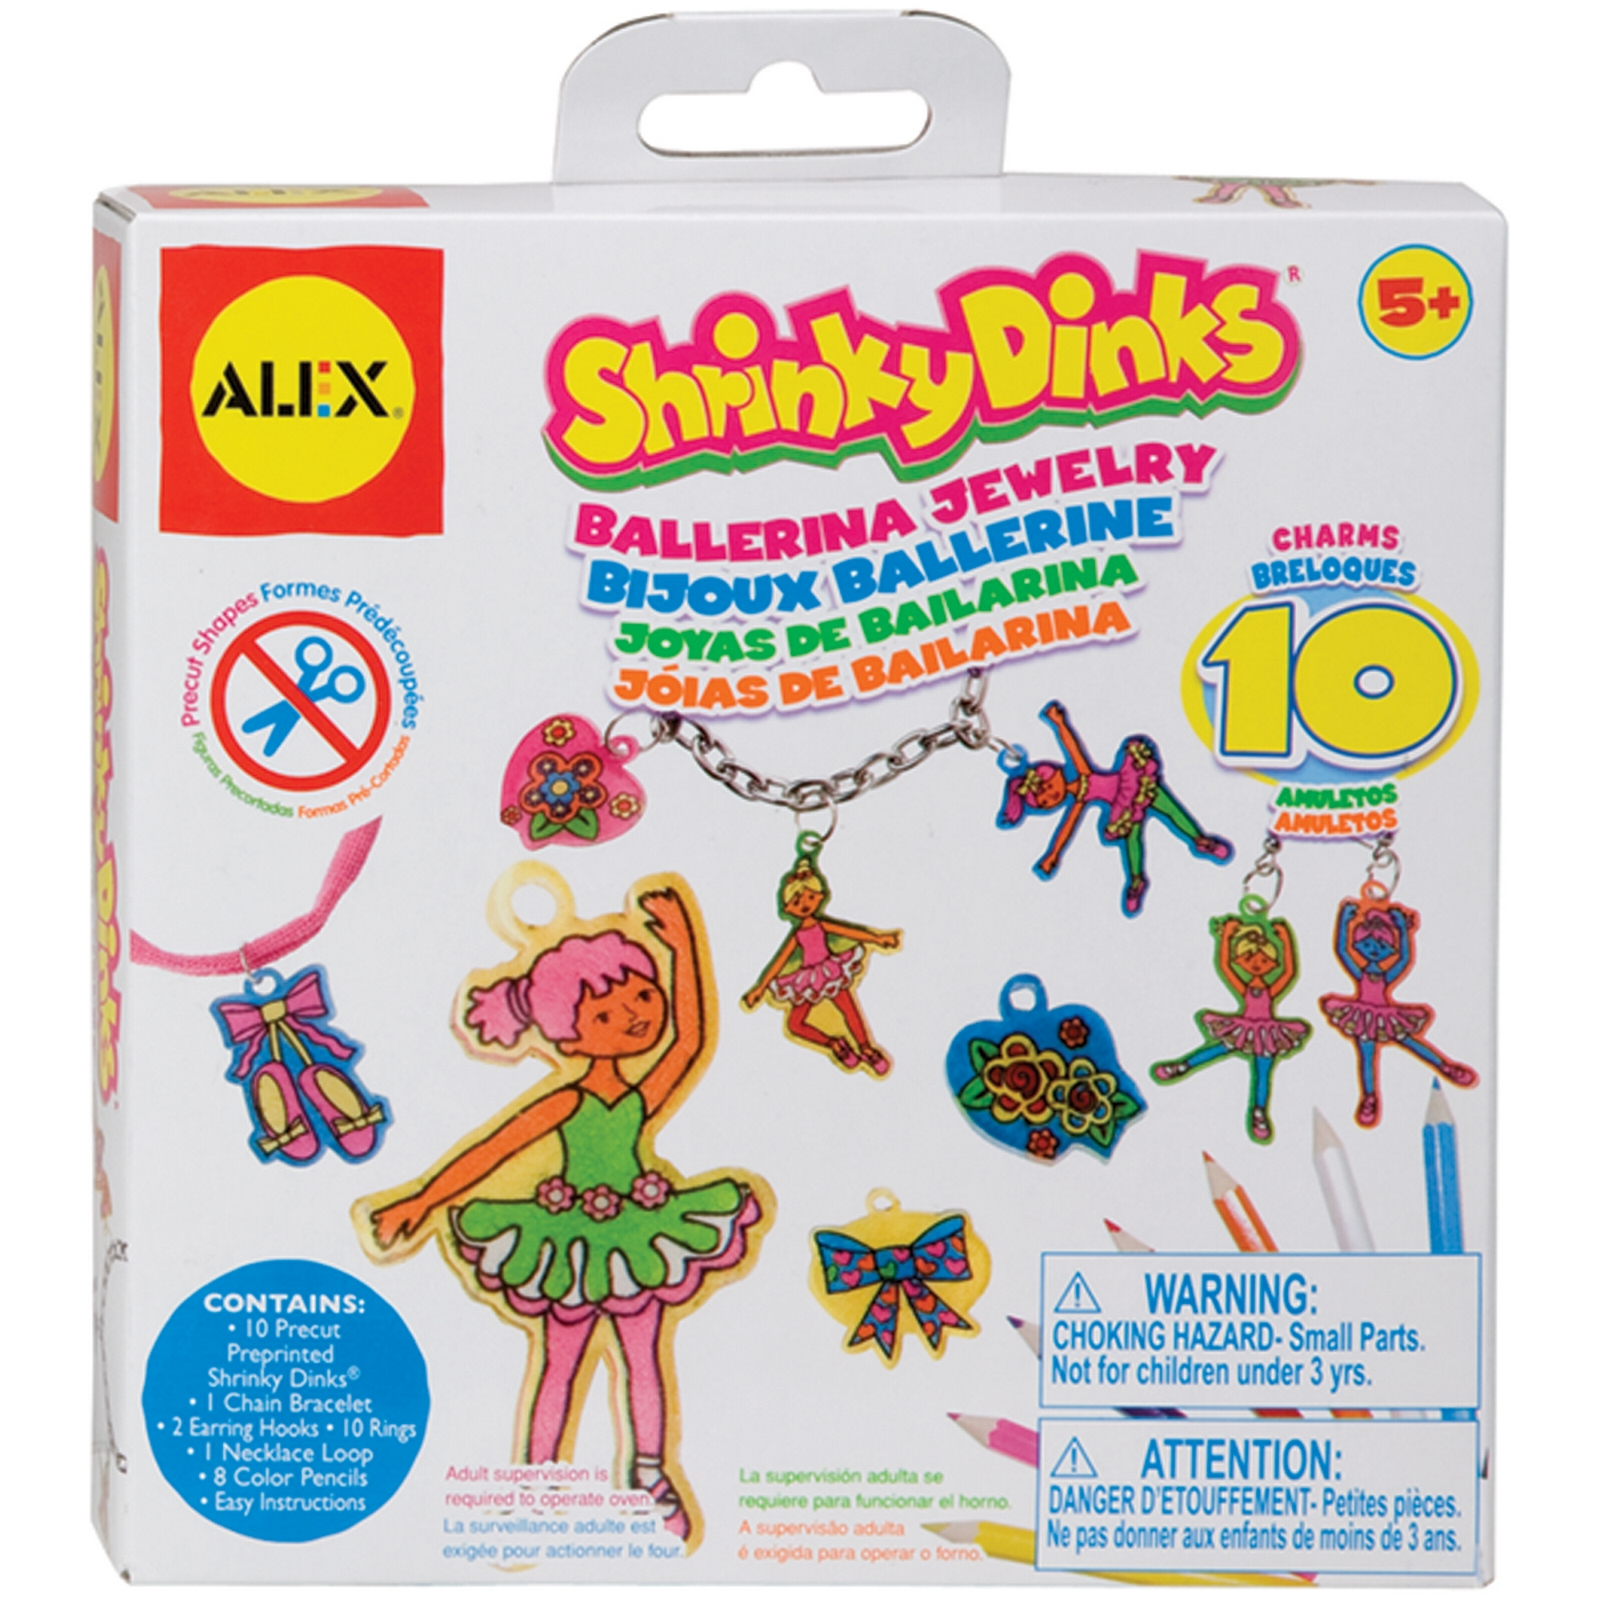 Alex Toys Shrinky Dinks Jewelry Kit Ballerina PartNumber: 021V005872892000P KsnValue: 5872892 MfgPartNumber: 494-B